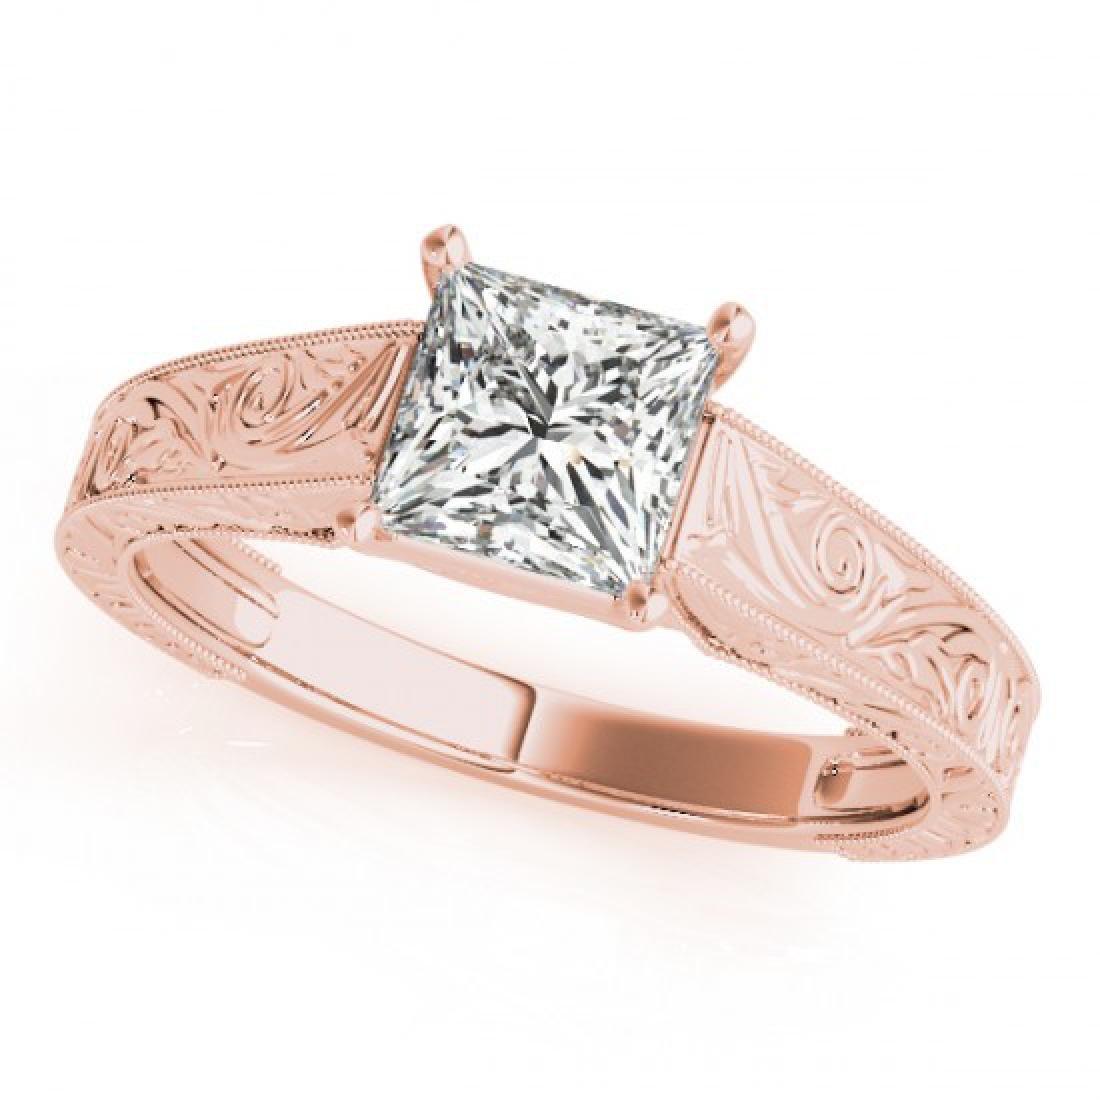 0.75 CTW Certified VS/SI Princess Diamond Ring 14K Rose